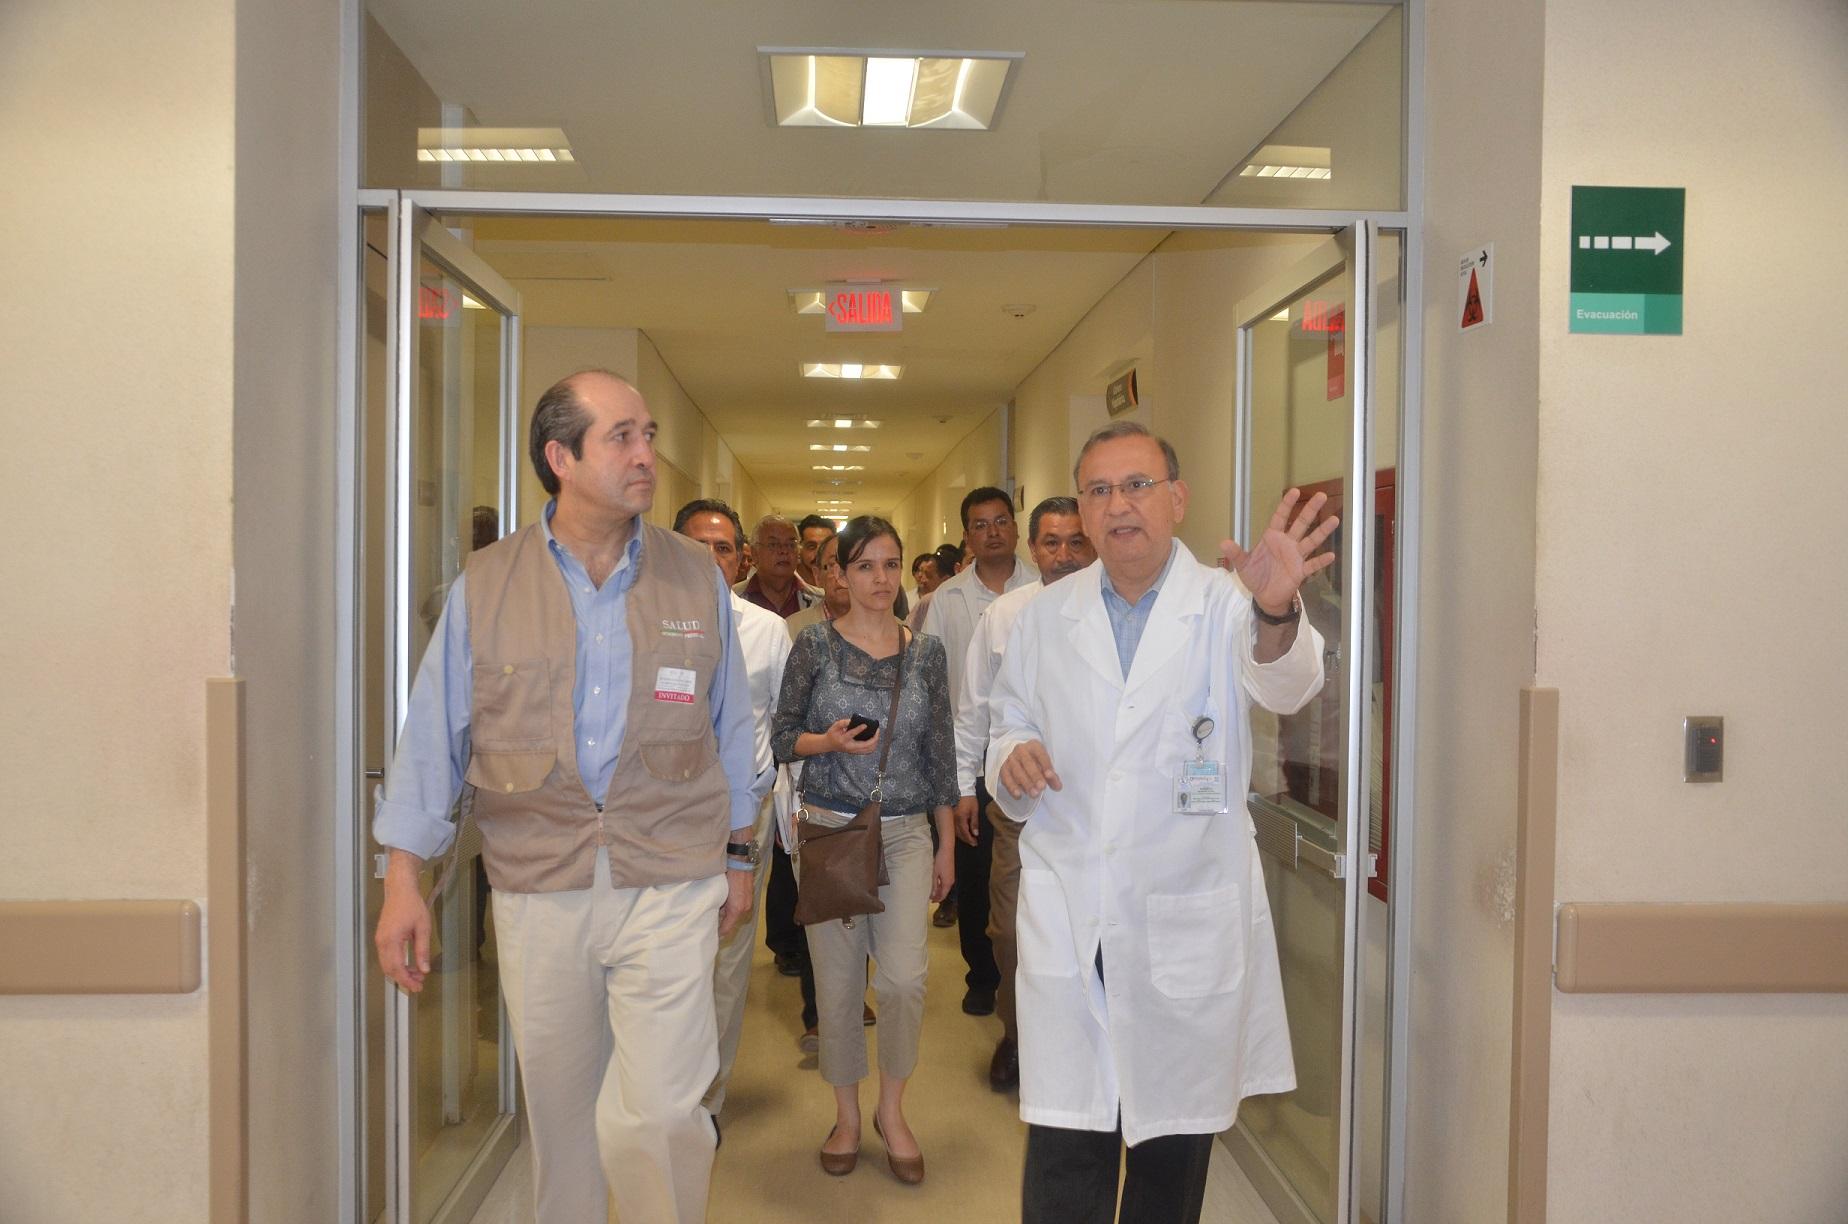 260914 Visita al HospitalJuan Maria de Salvatierra 04jpg